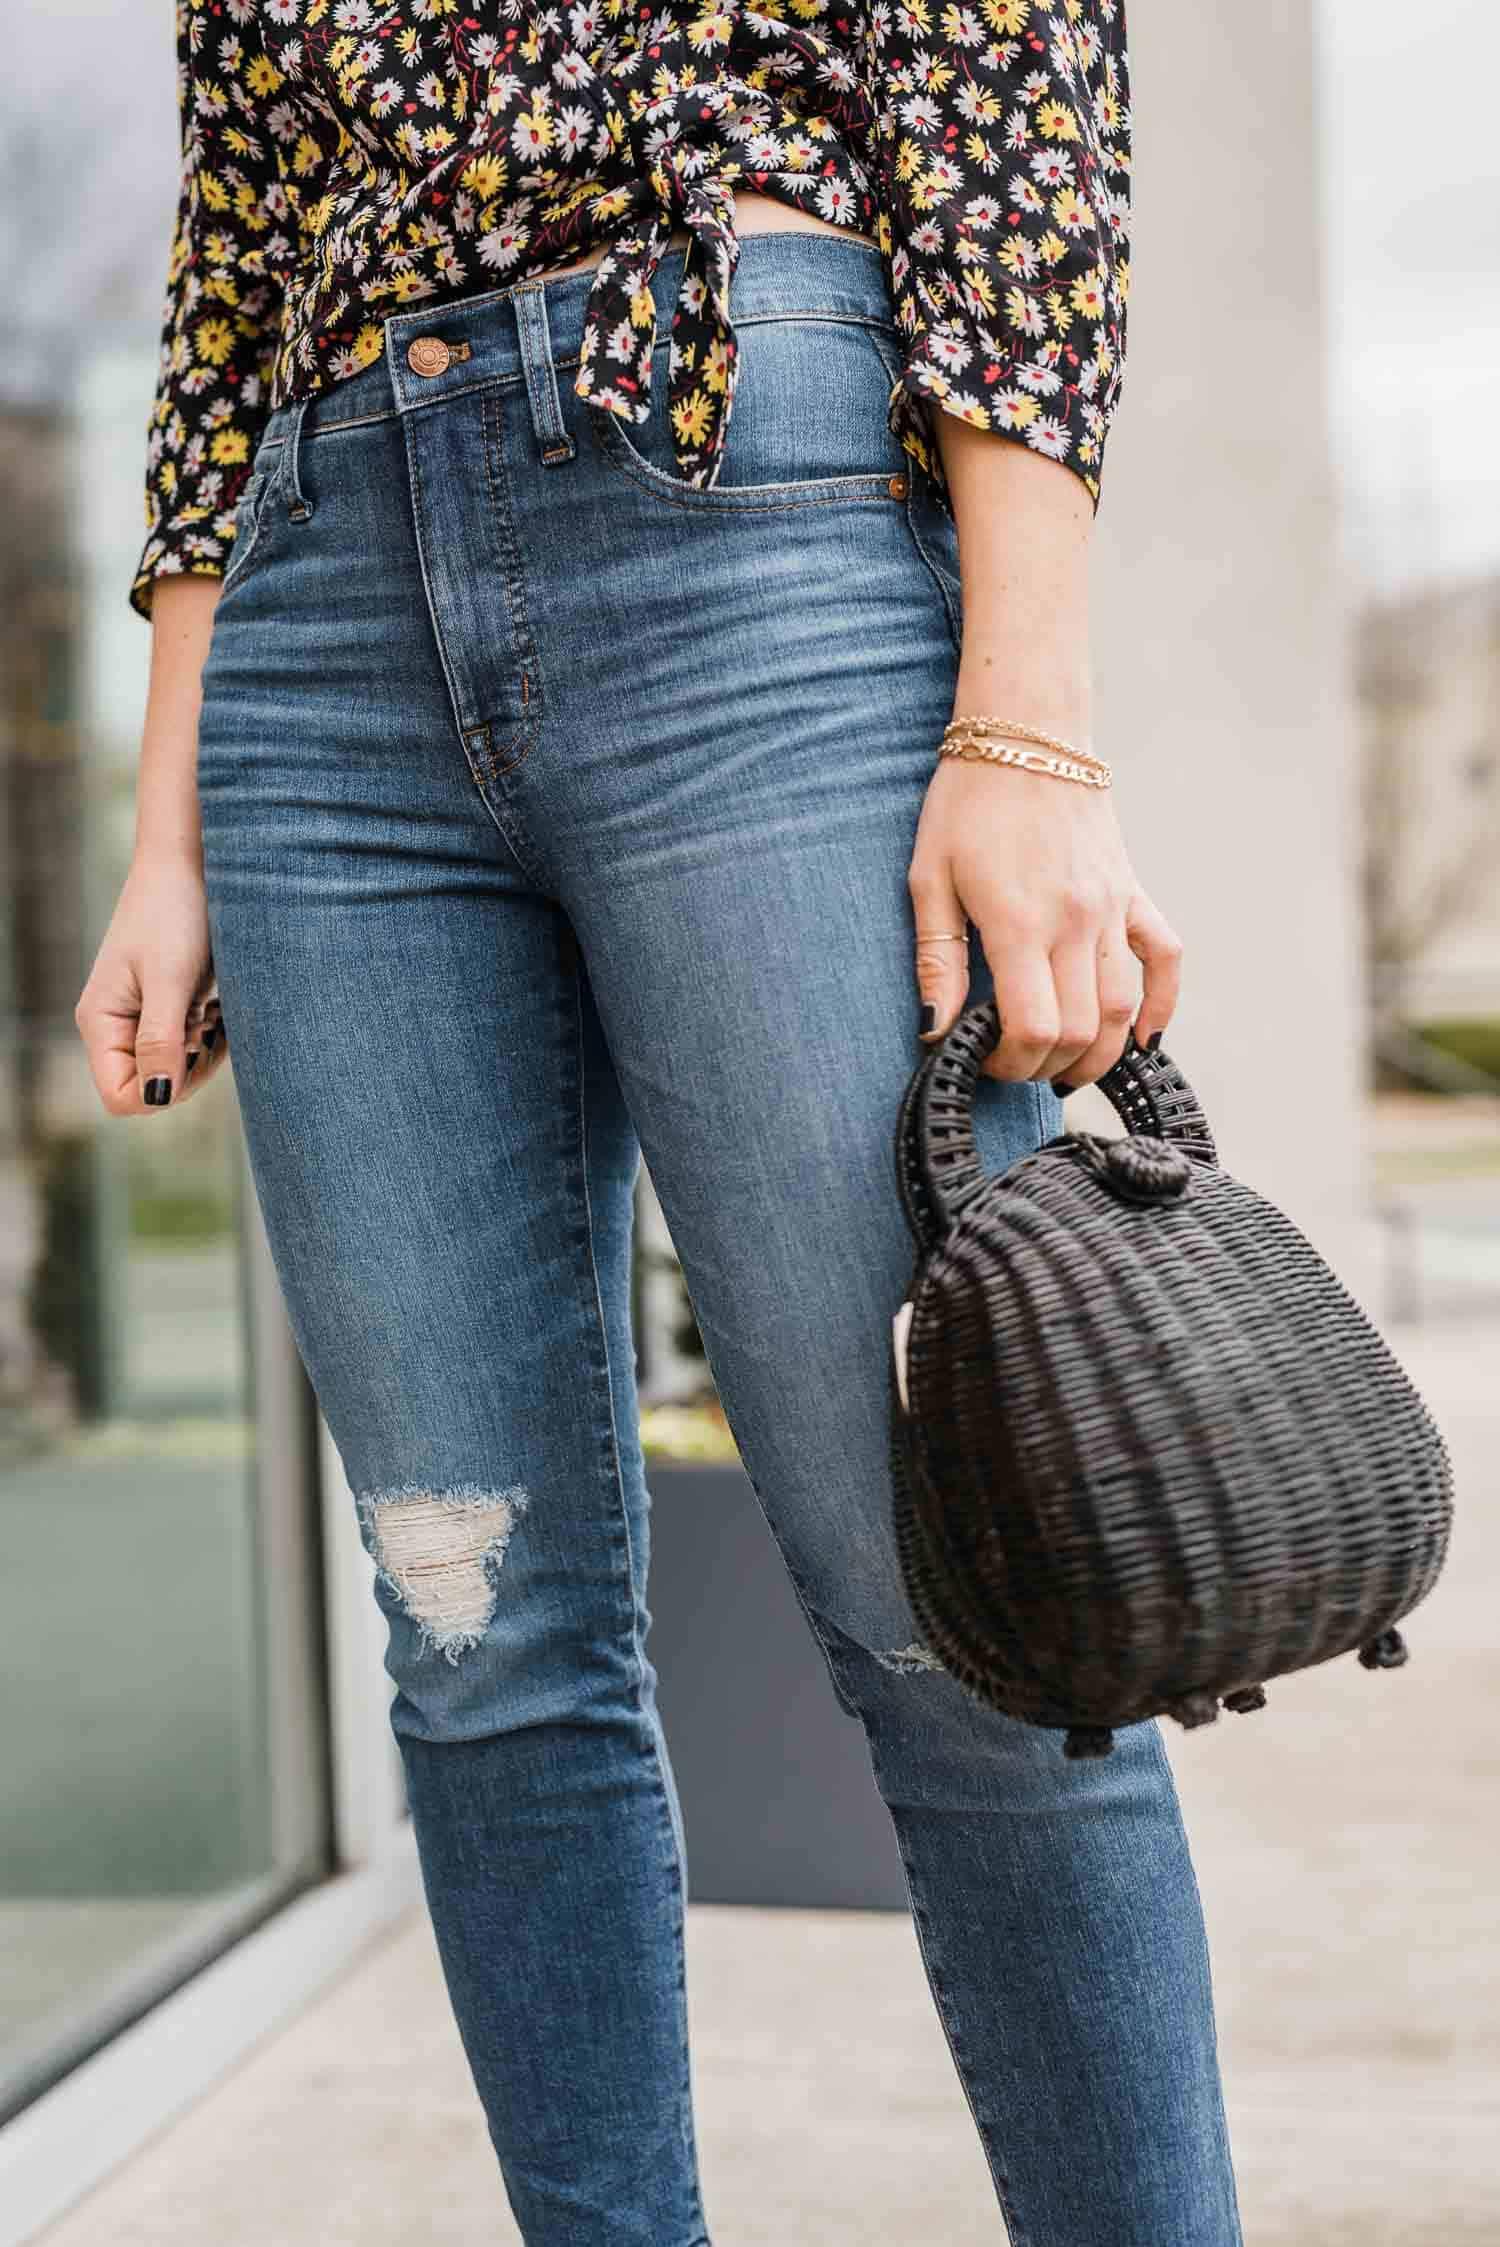 My Style Vita is featuring a black Cult Gaia Millie Rattan Bag.